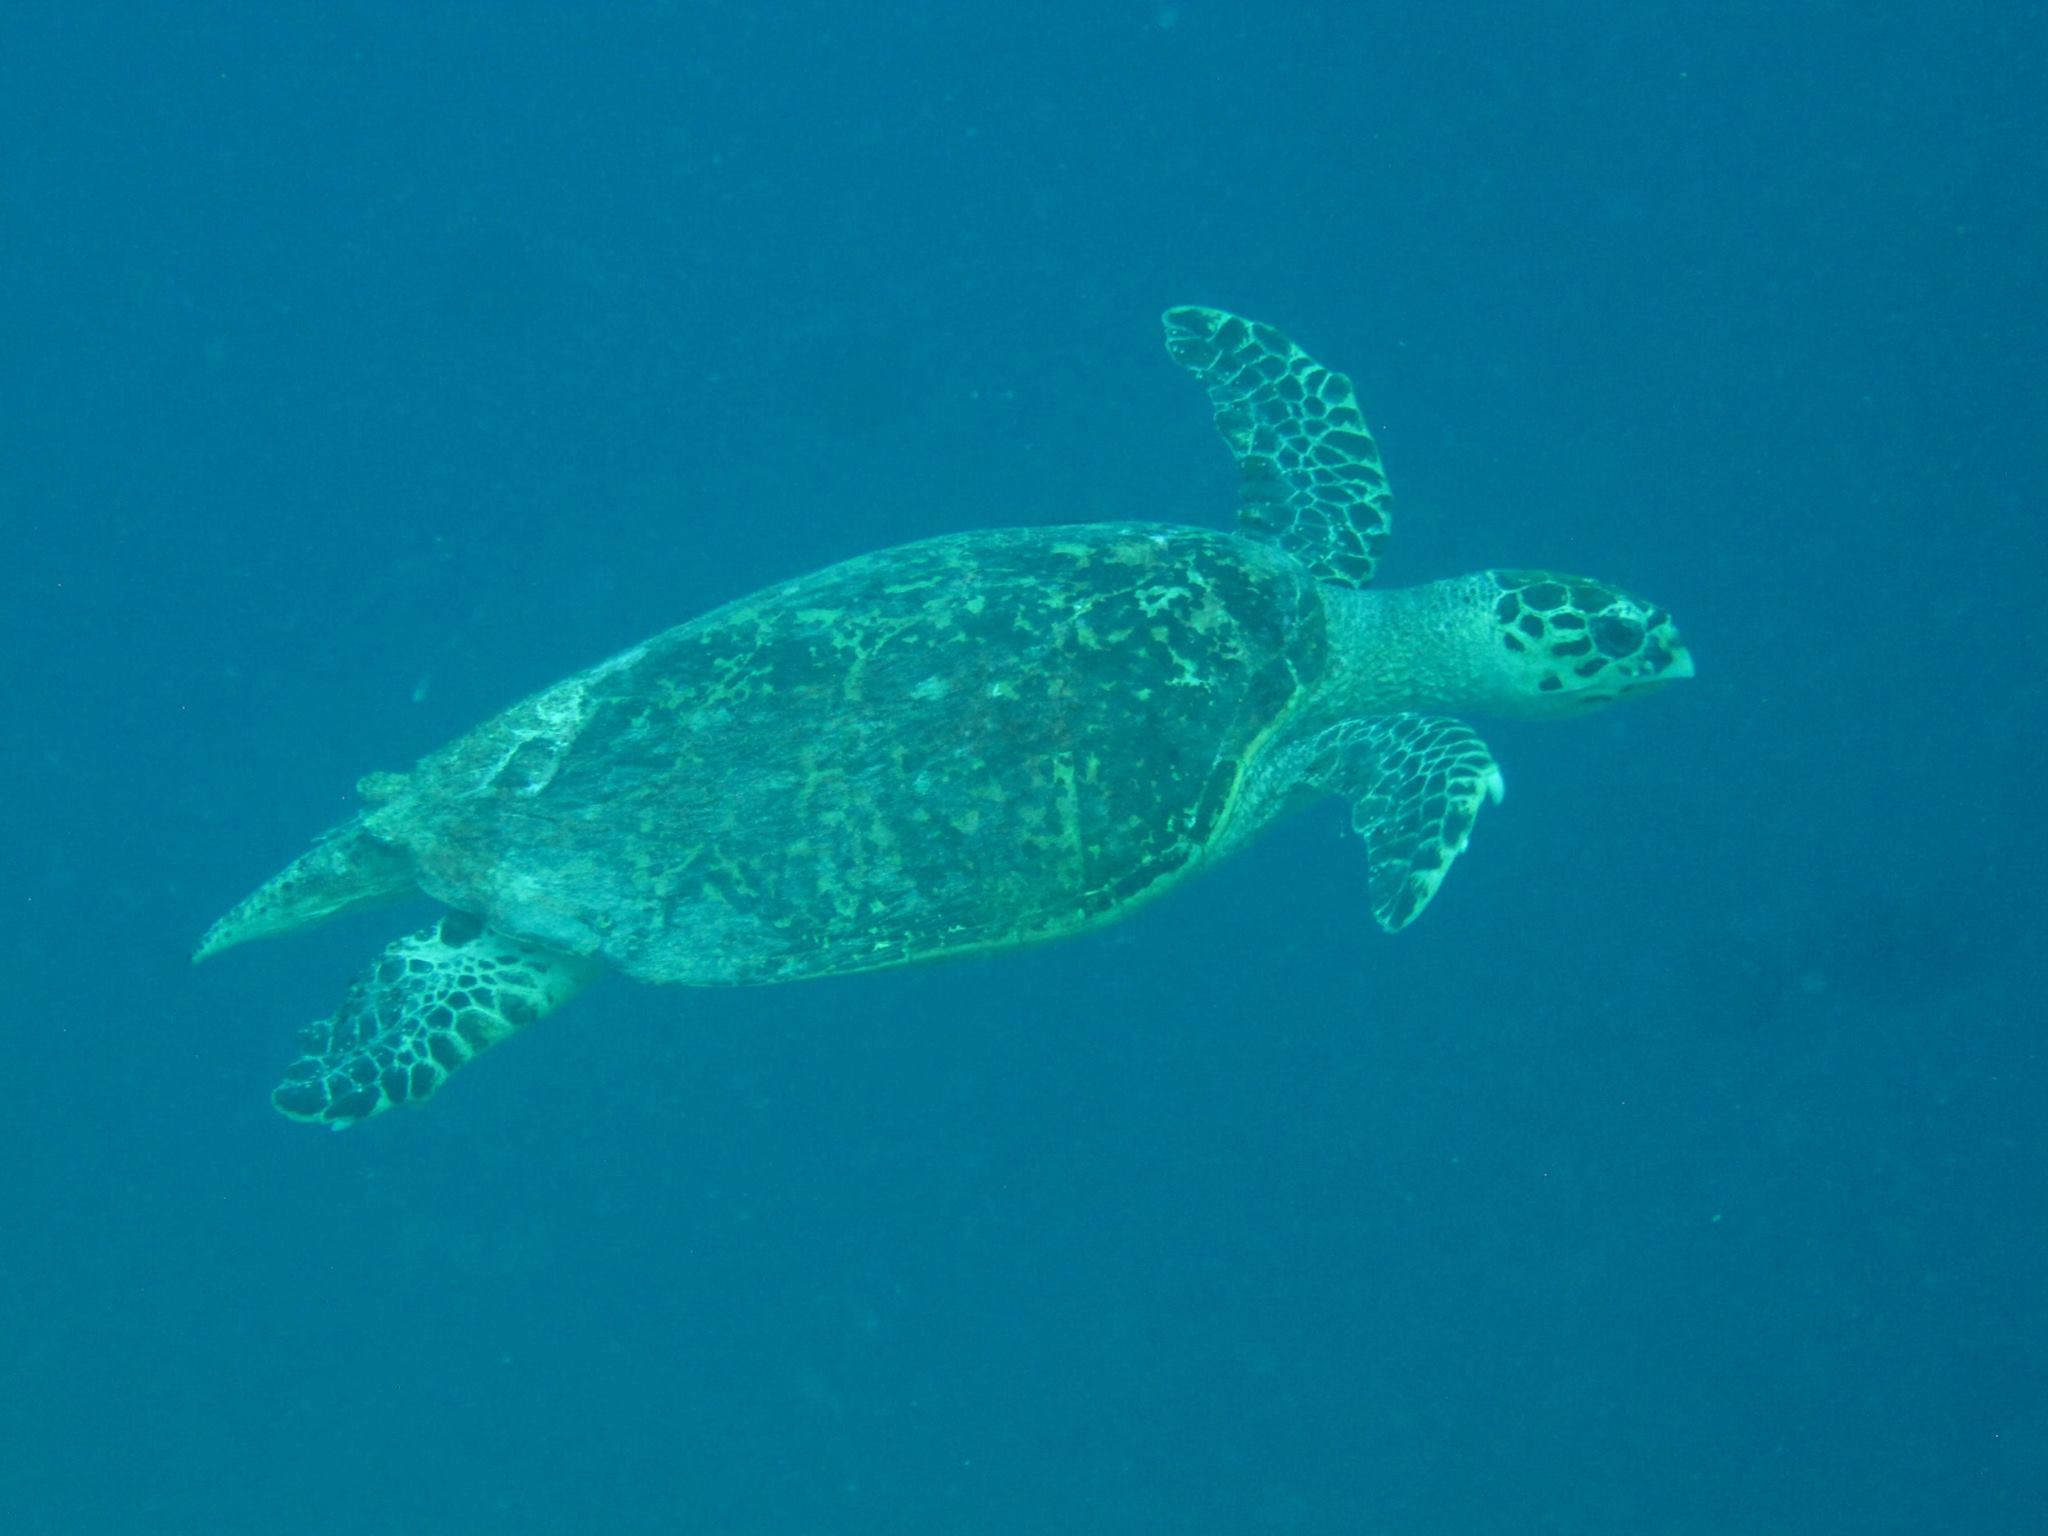 invite-to-paradise-sri-lanka-and-maldives-specialists-travel-agent-tour-operator-customer-review--feedback-joel-rhian-atmopshere-kanifushi-sea-turtle-2.jpg